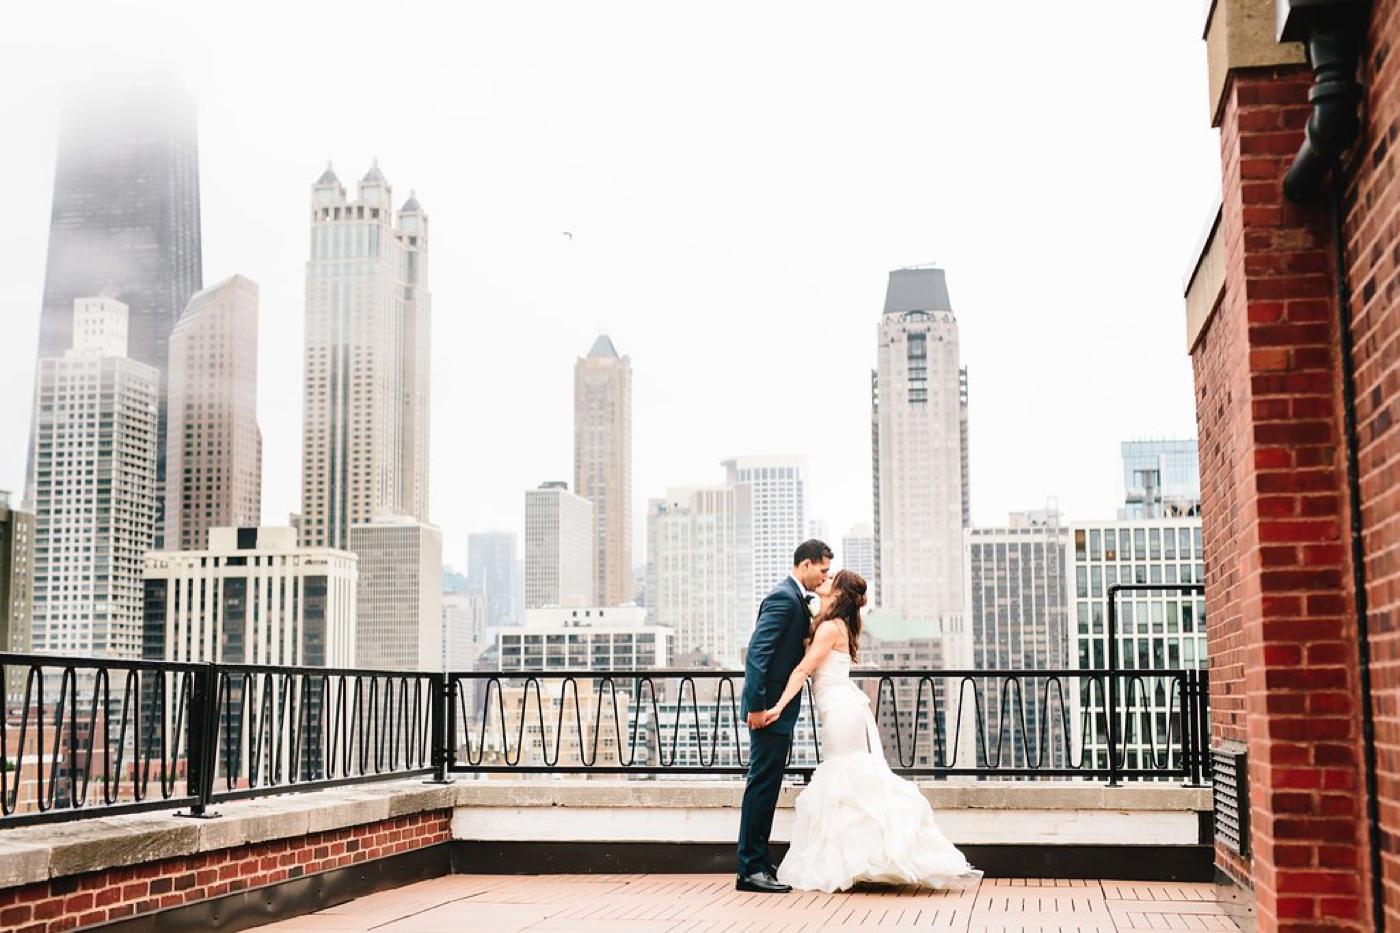 chicago-fine-art-wedding-photography-sakamuri26